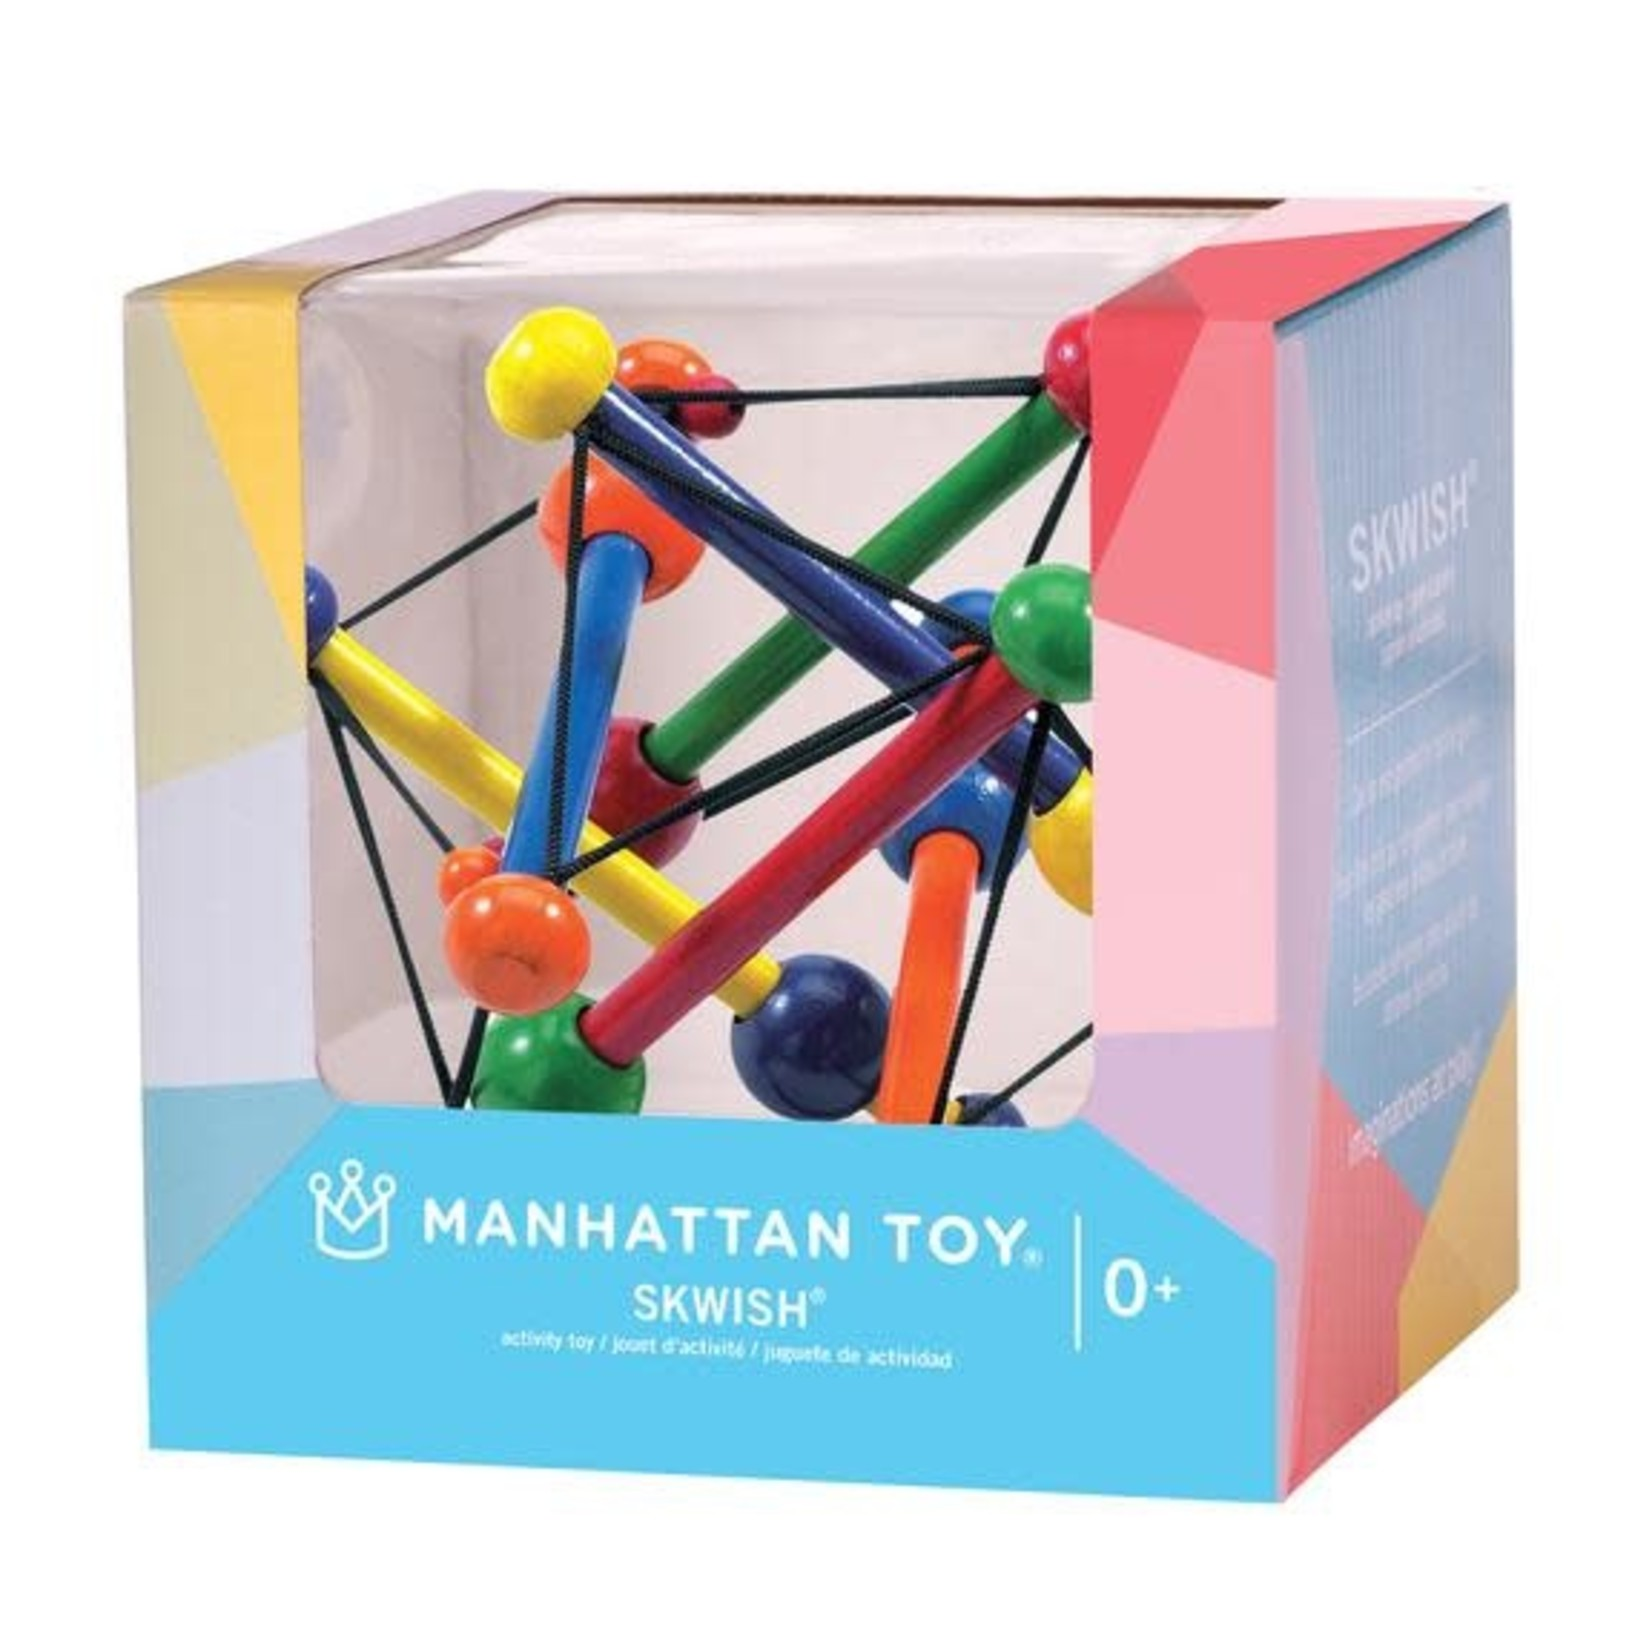 Manhattan Toy Skwish Classic Boxed